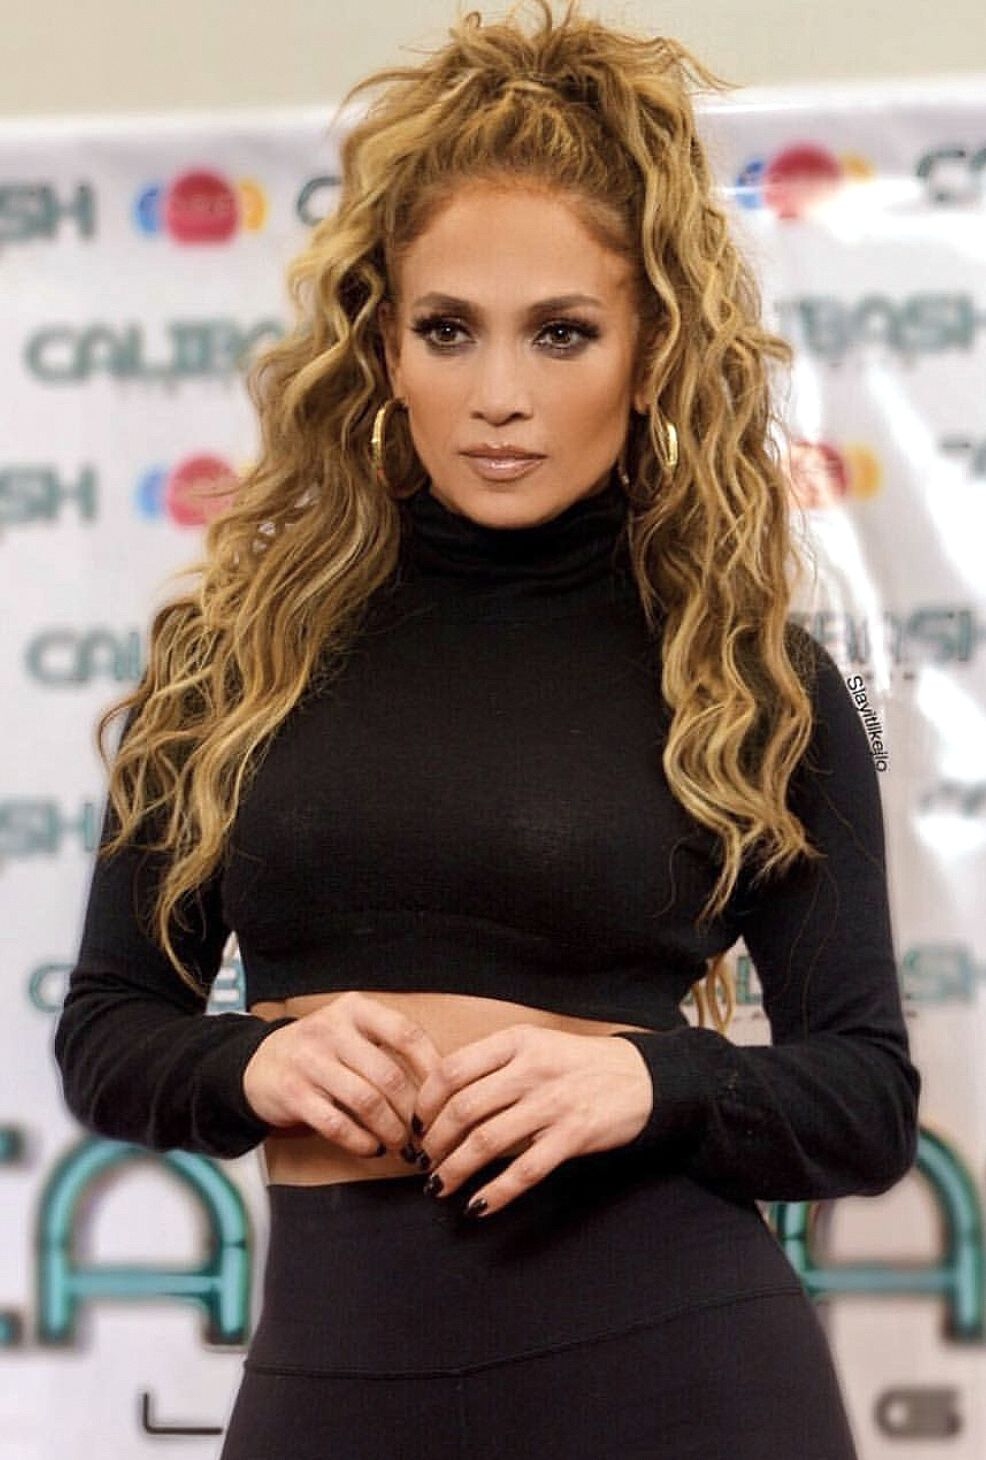 J Lo s Ex Casper Smart Hits Beach with Hot Chick